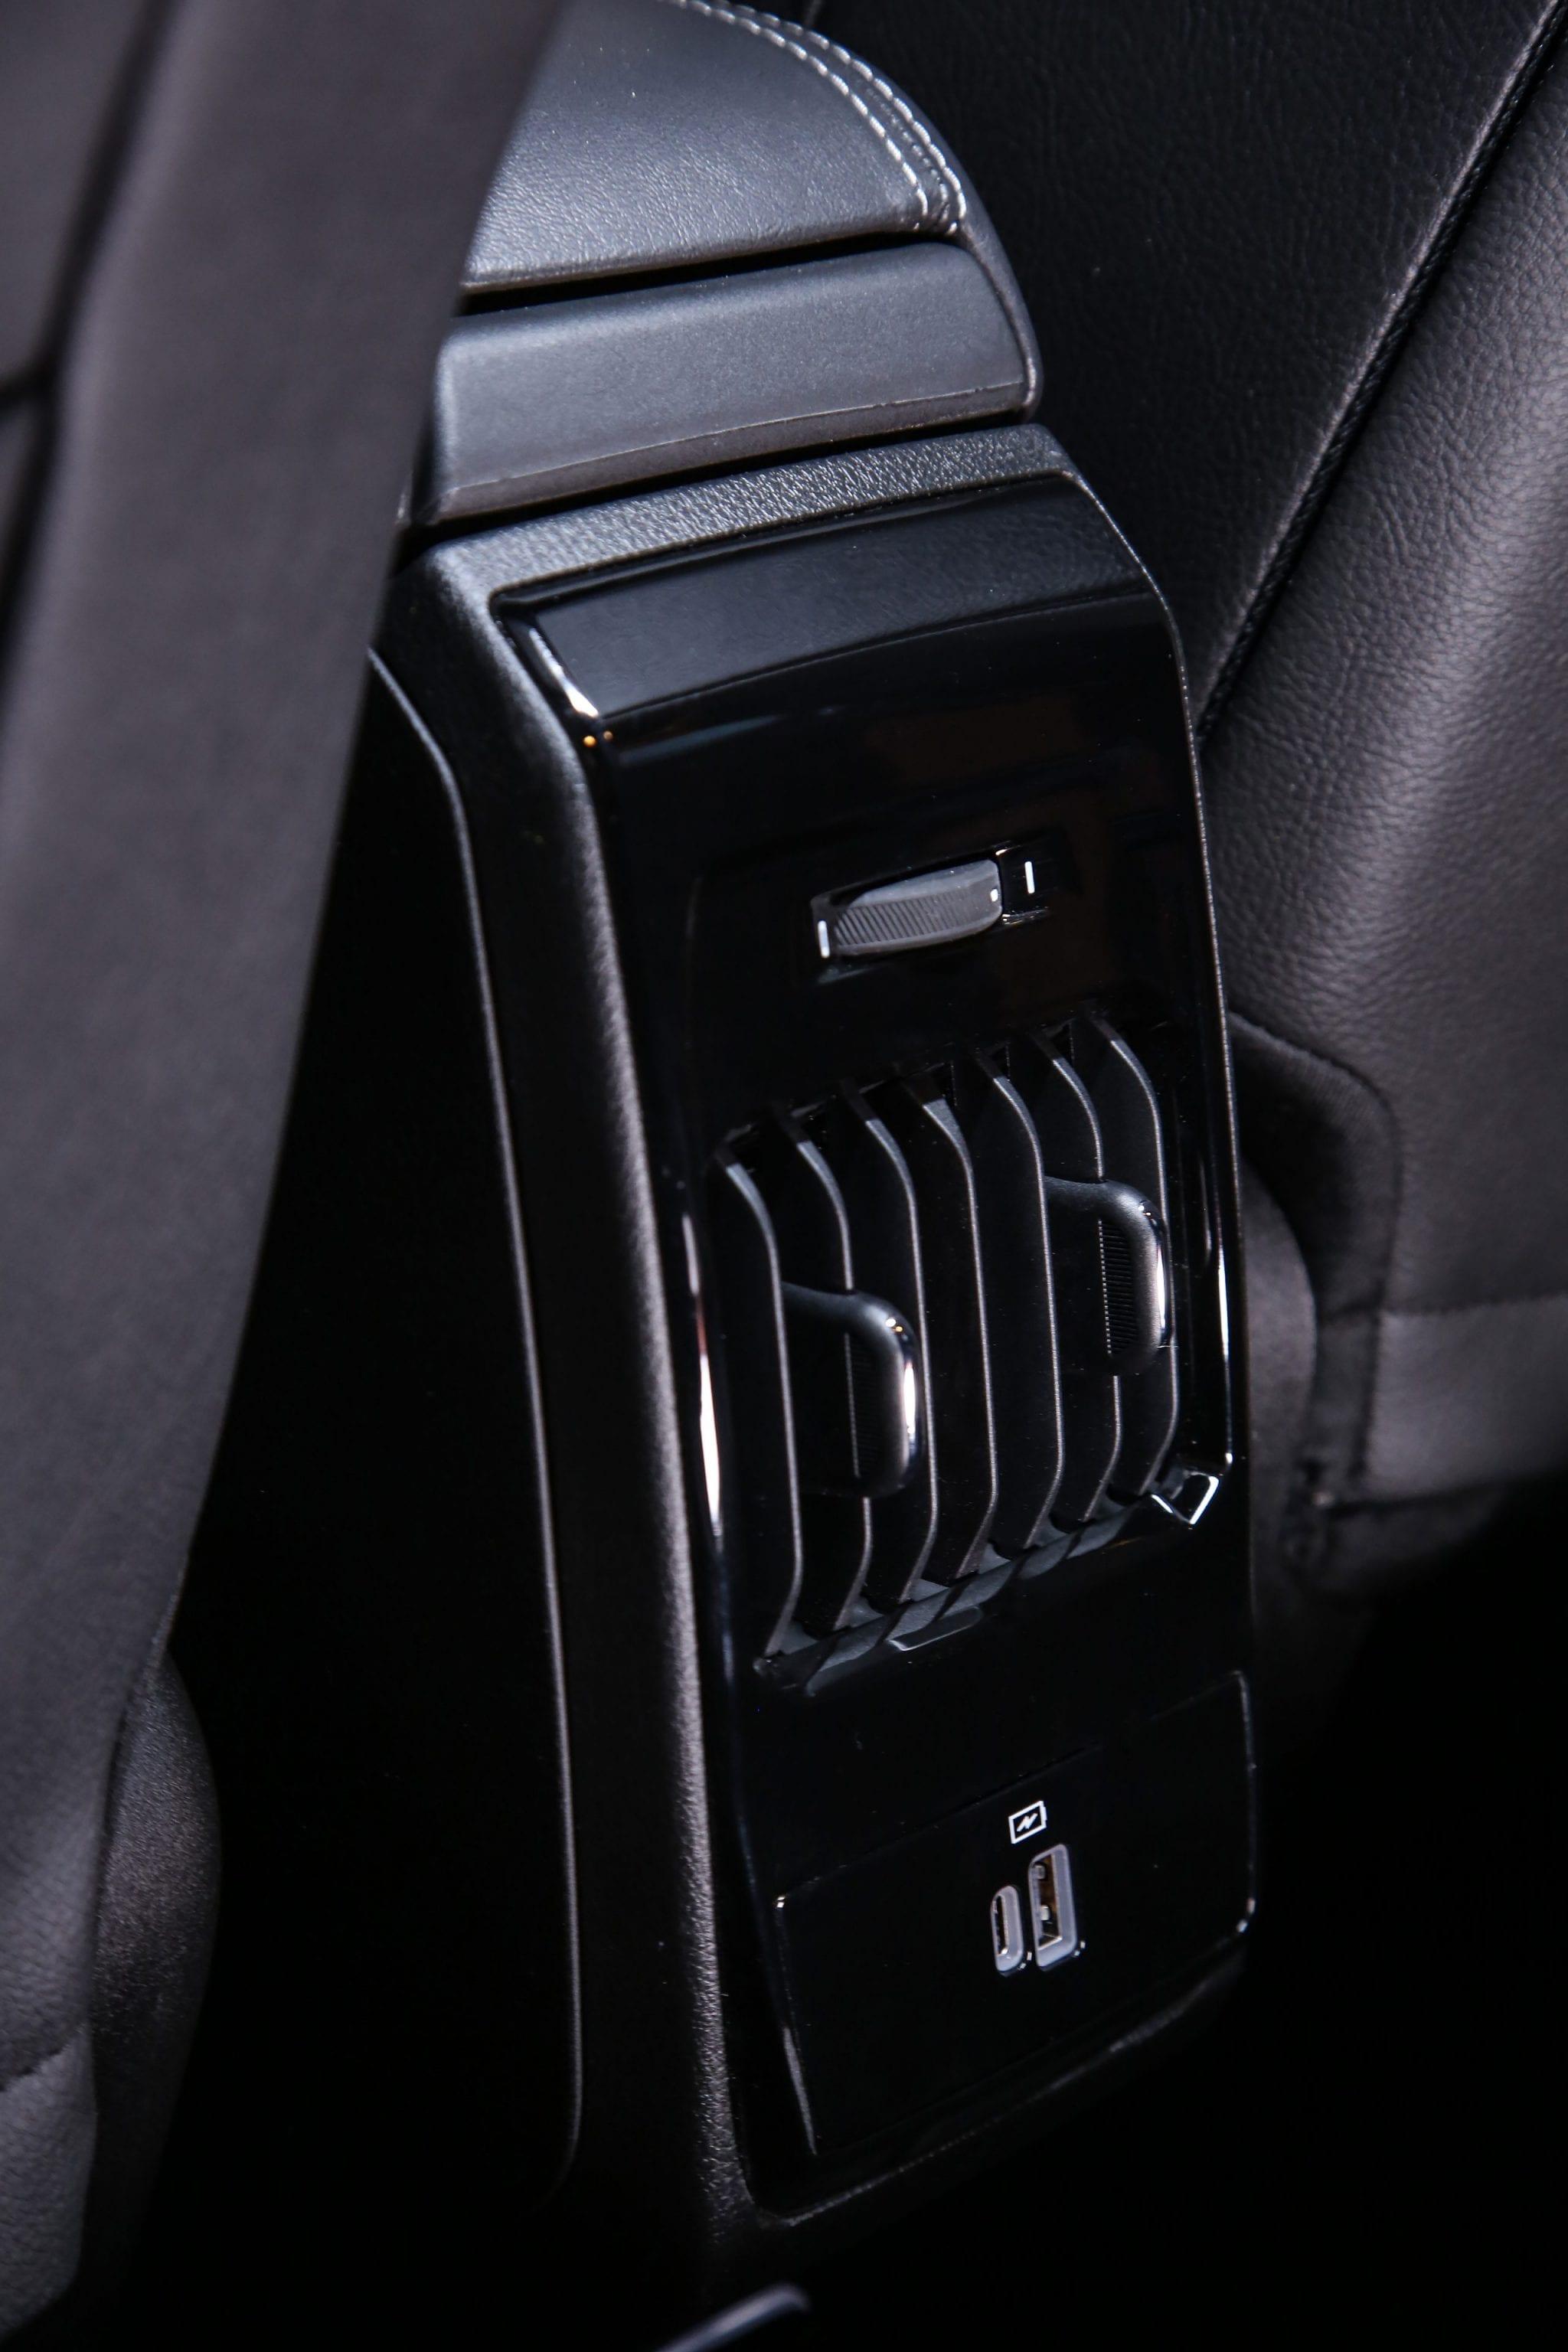 New Jeep Compass - ventilatie details